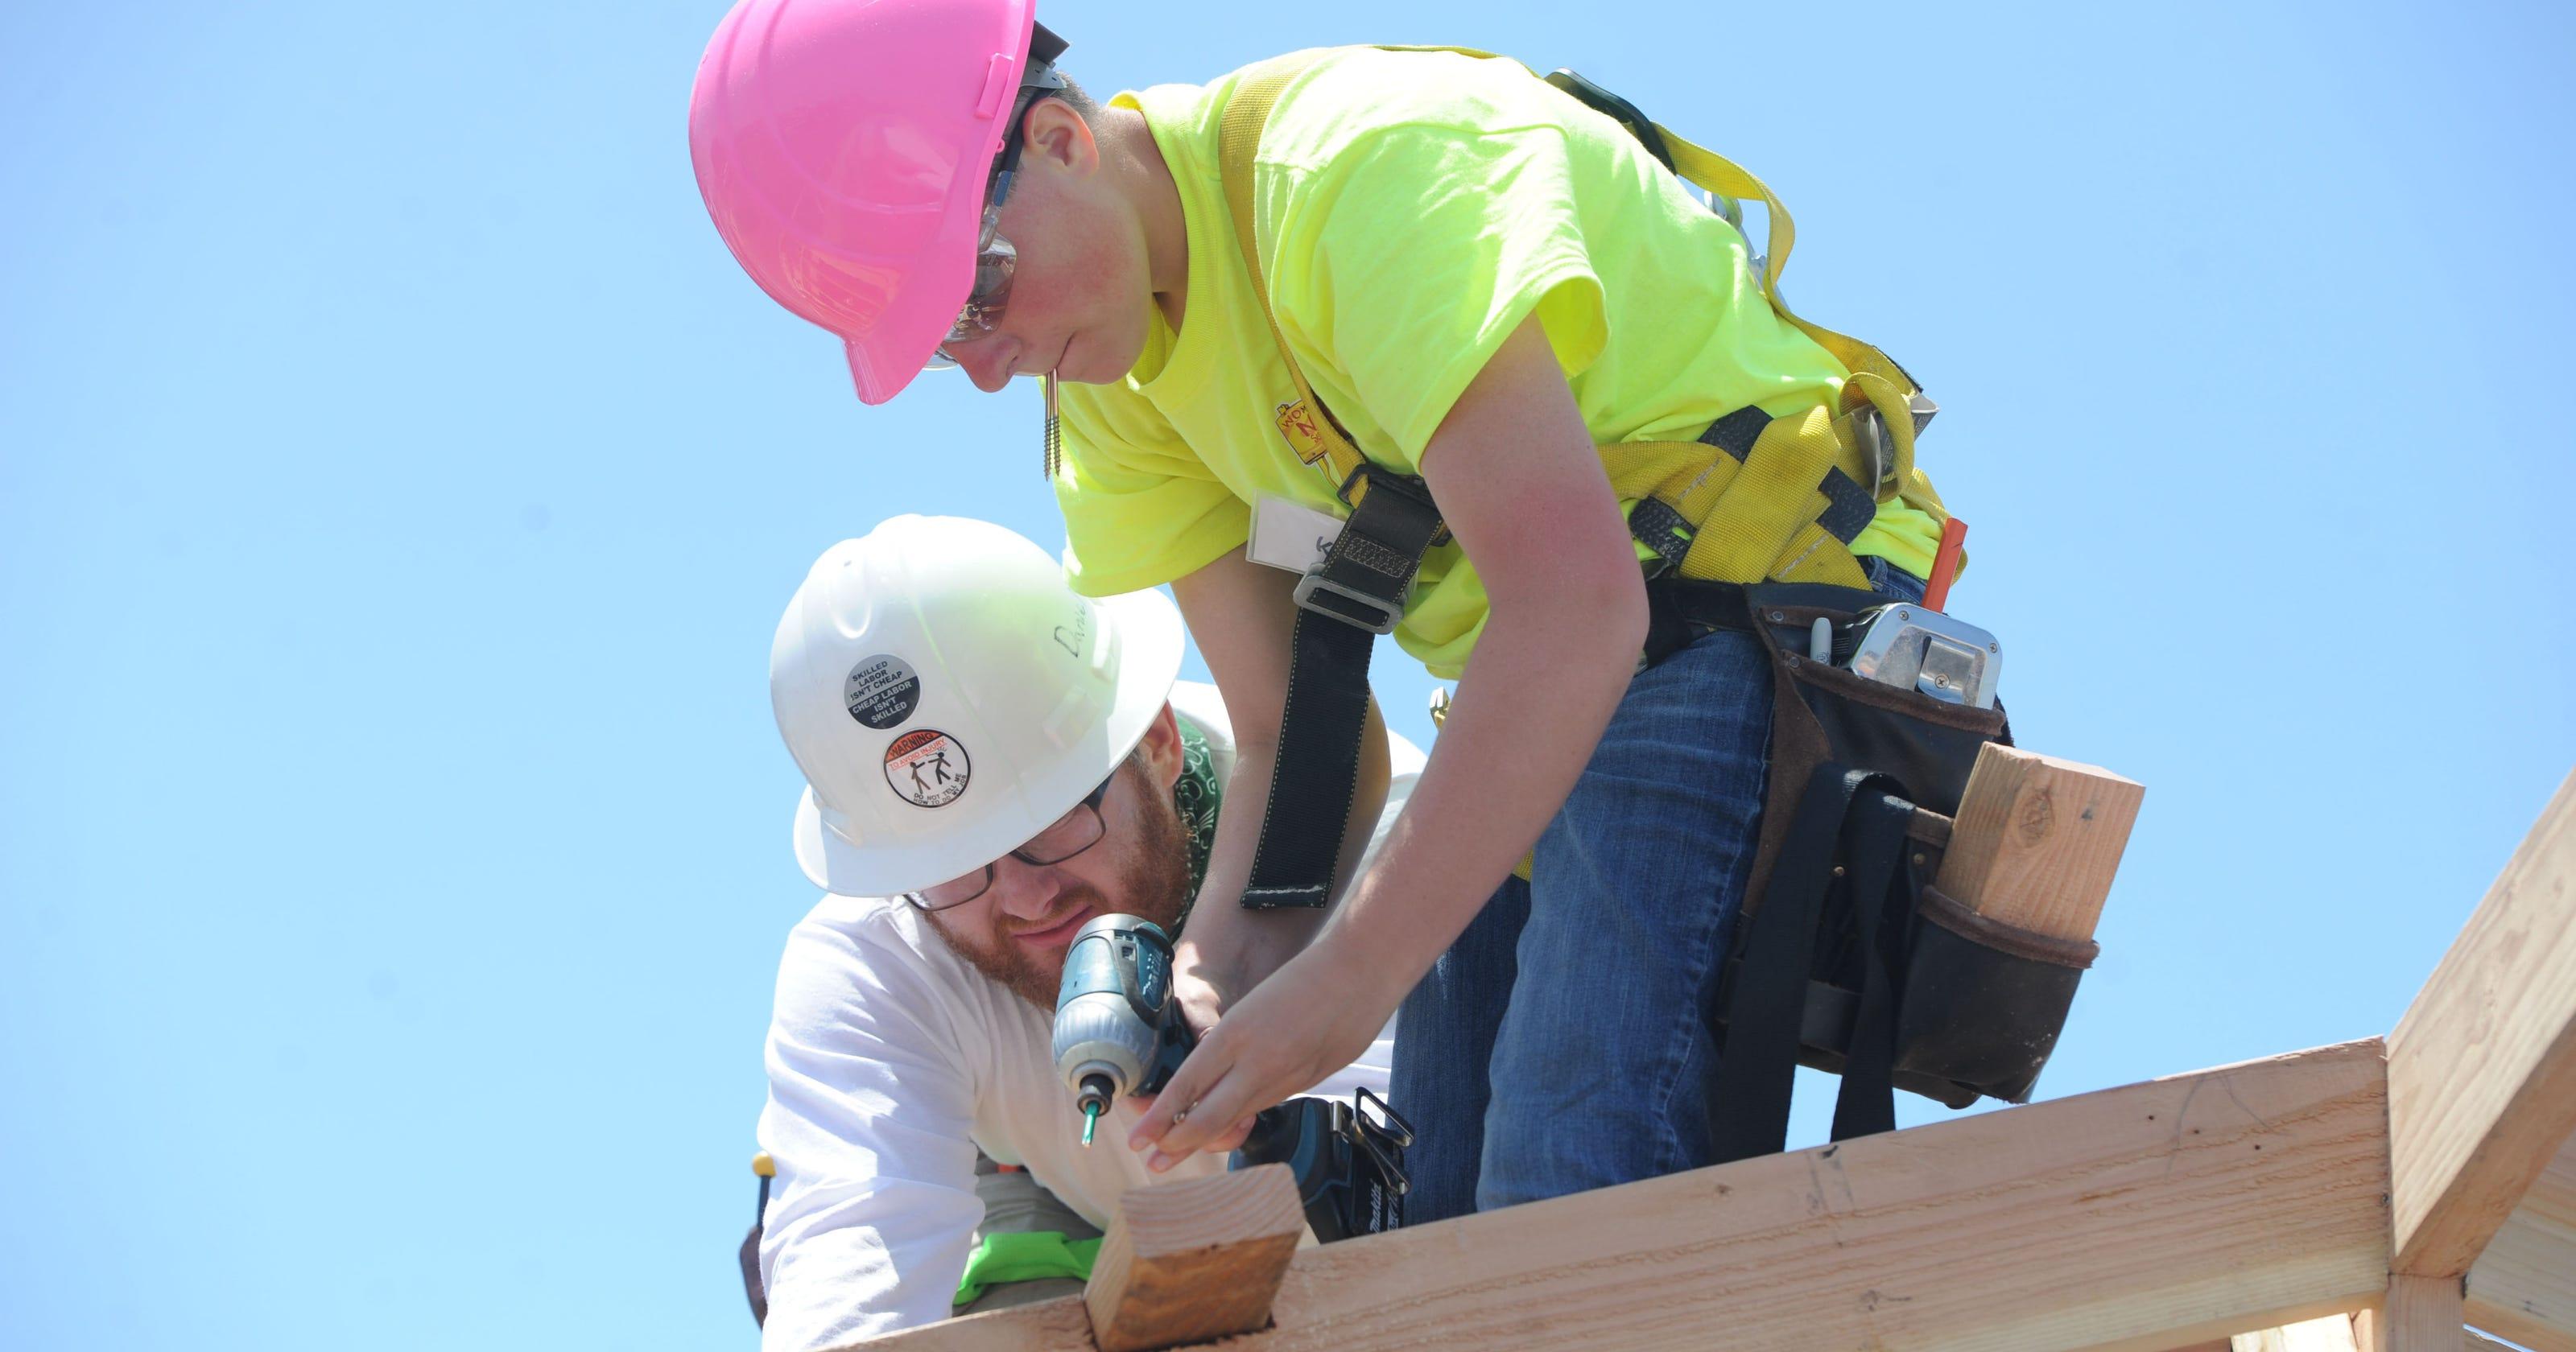 Ventura County girls build construction skills with tiny house